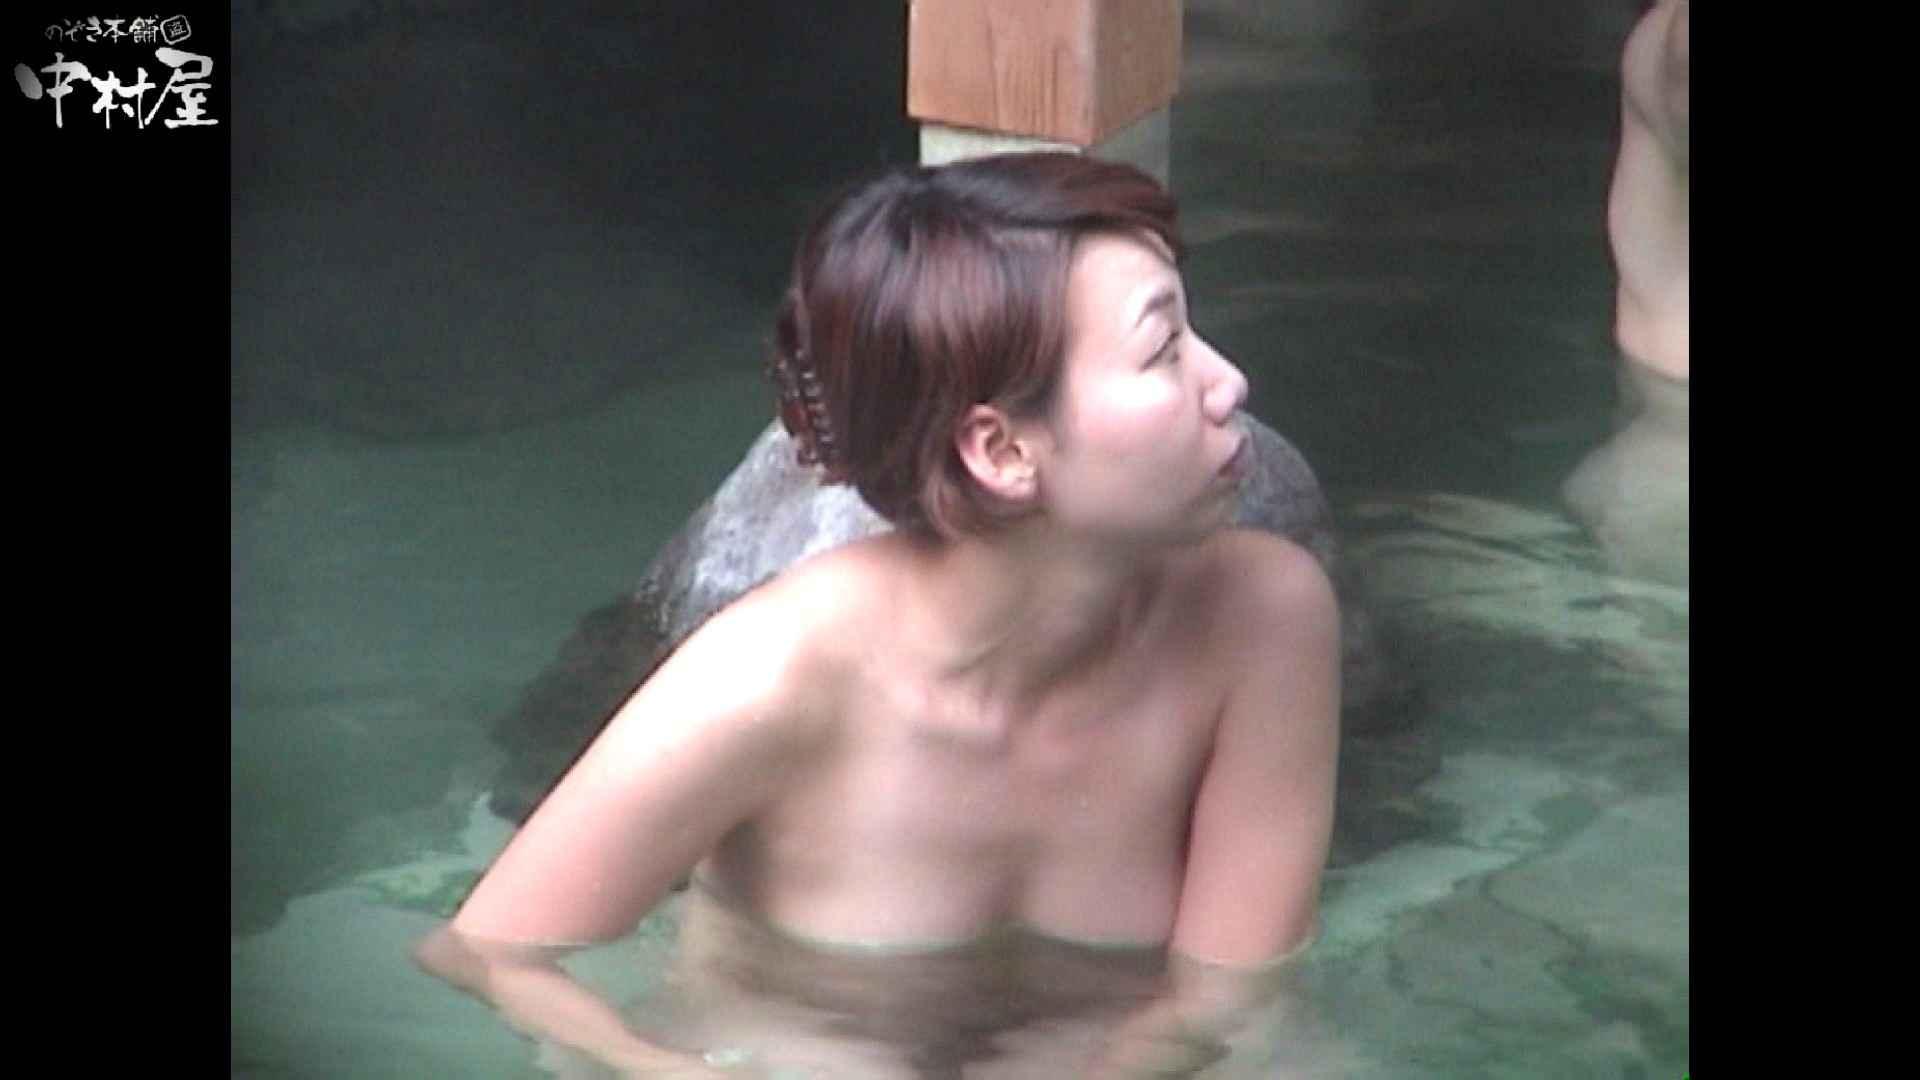 Aquaな露天風呂Vol.951 盗撮師作品 | 露天風呂突入  96pic 7